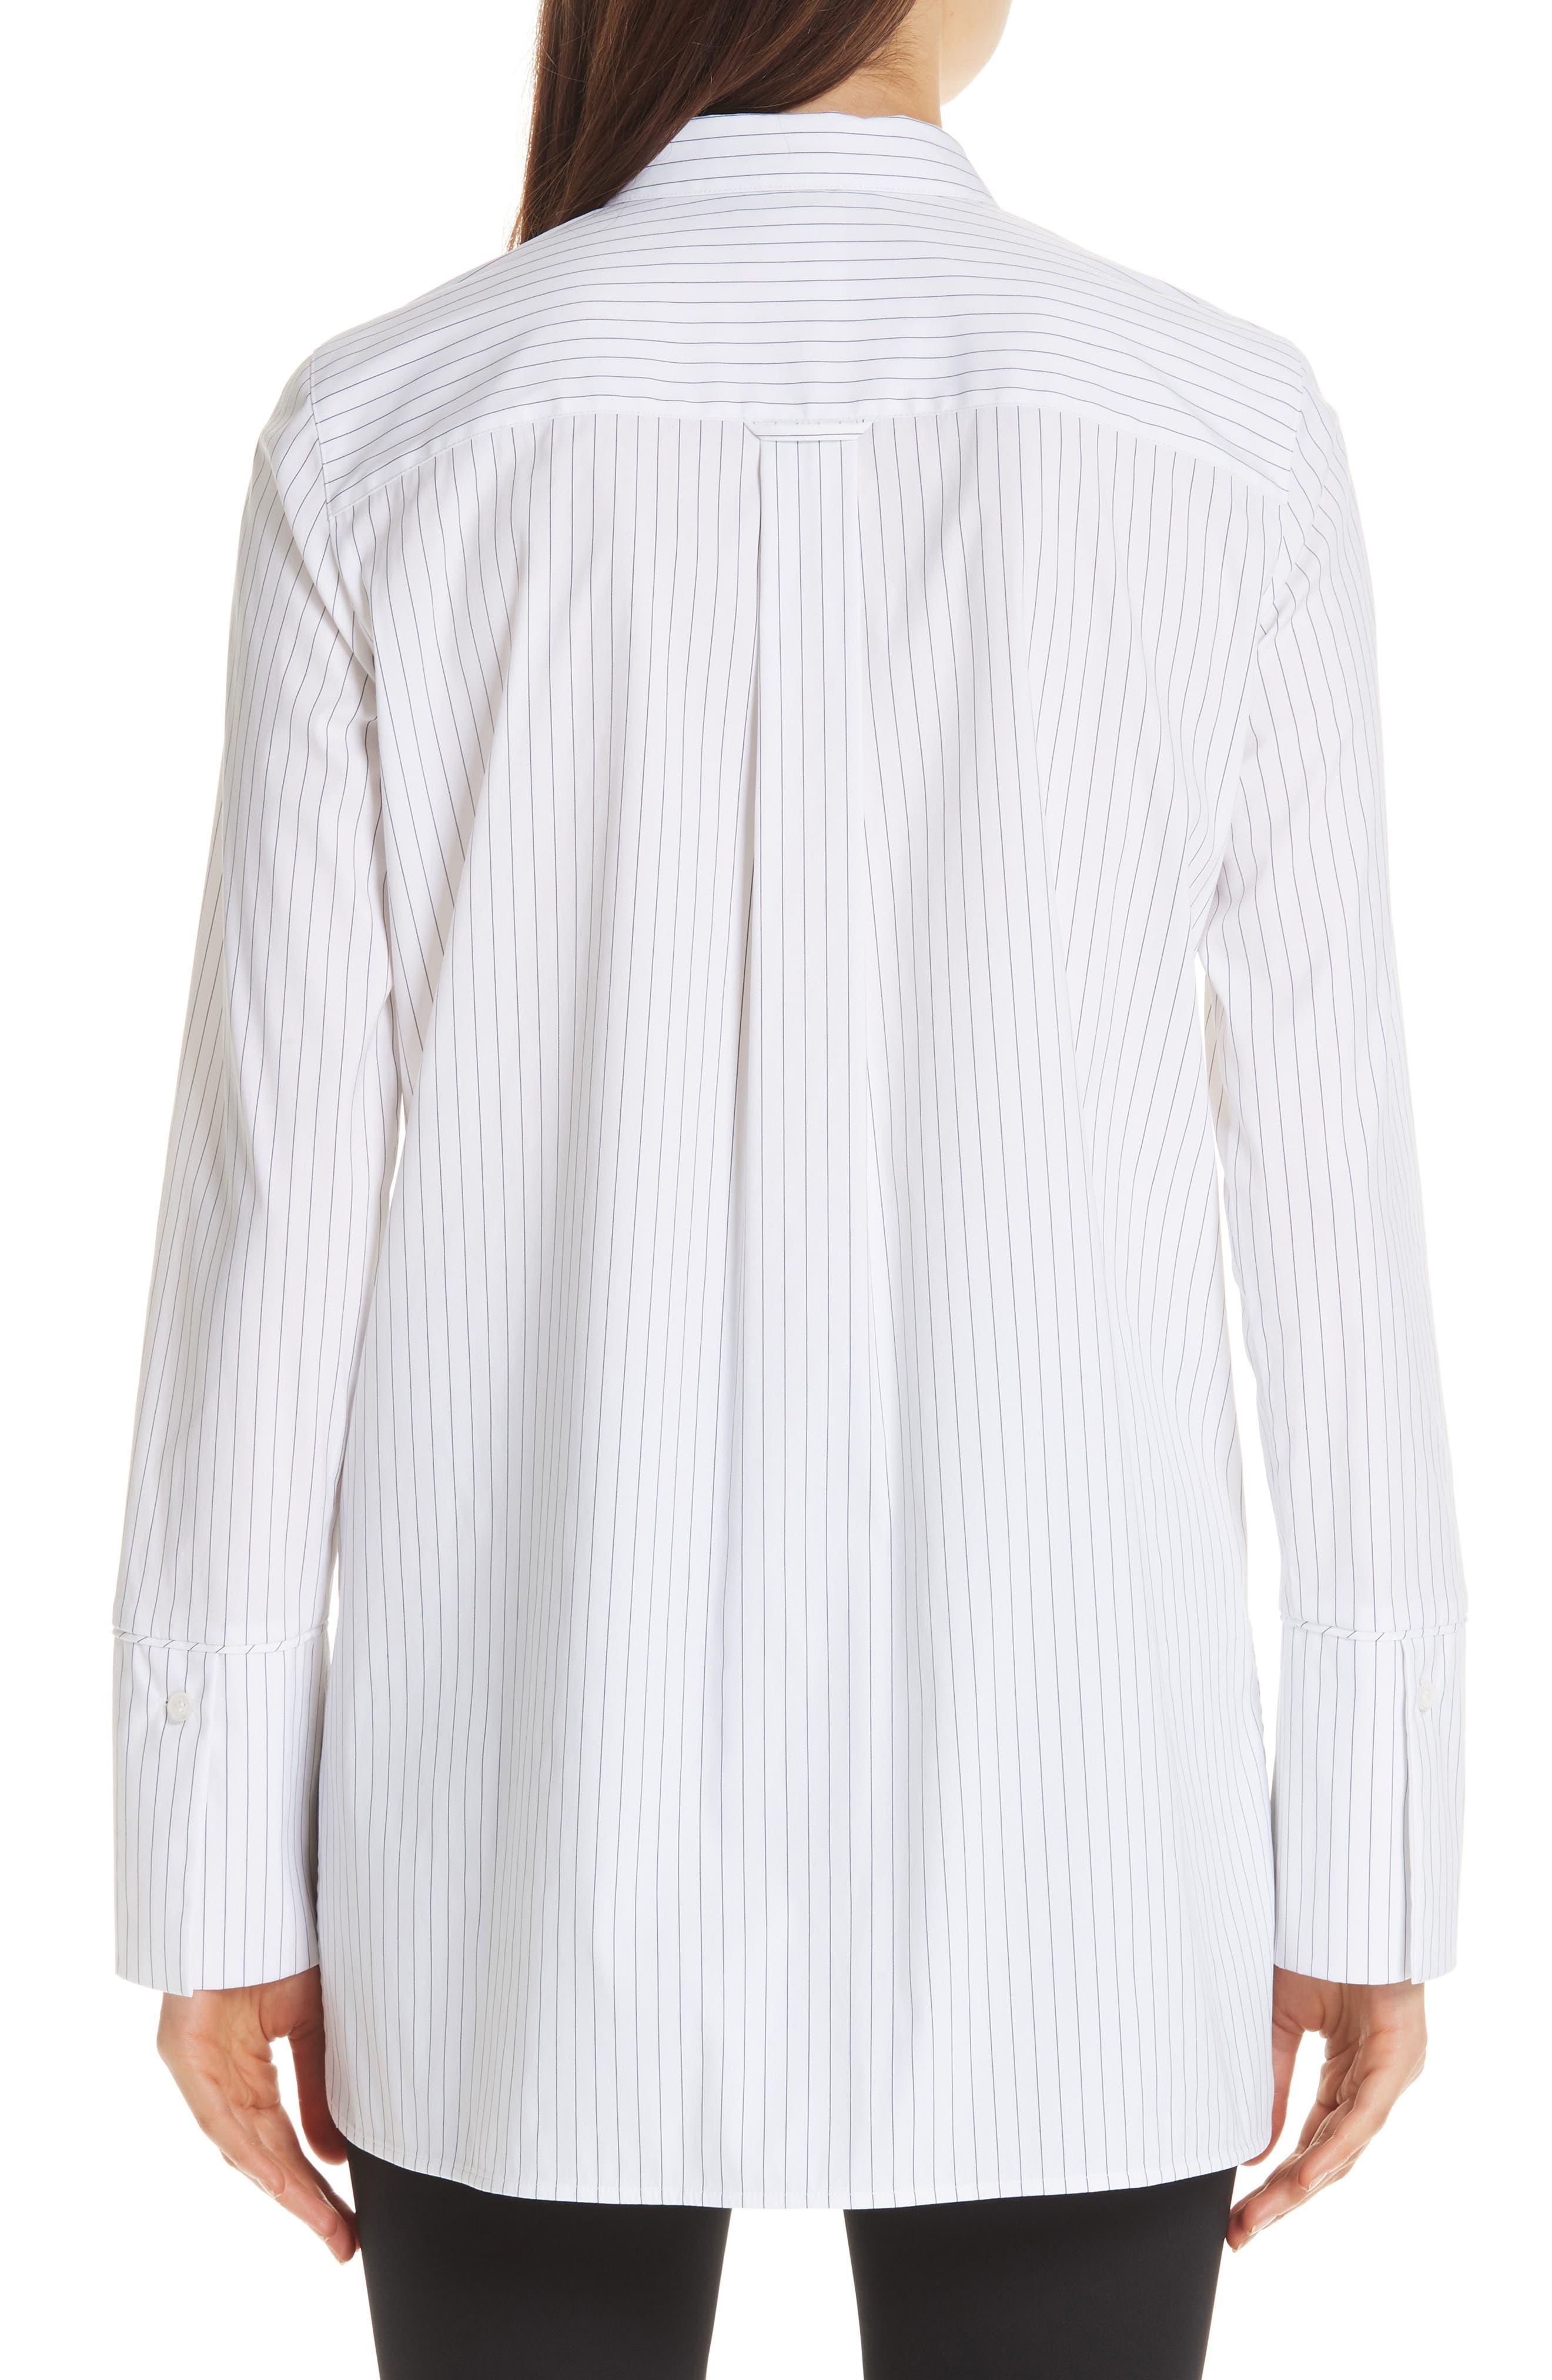 Annaleise Contrast Tie Stanford Stripe Blouse,                             Alternate thumbnail 2, color,                             BLACK MULTI